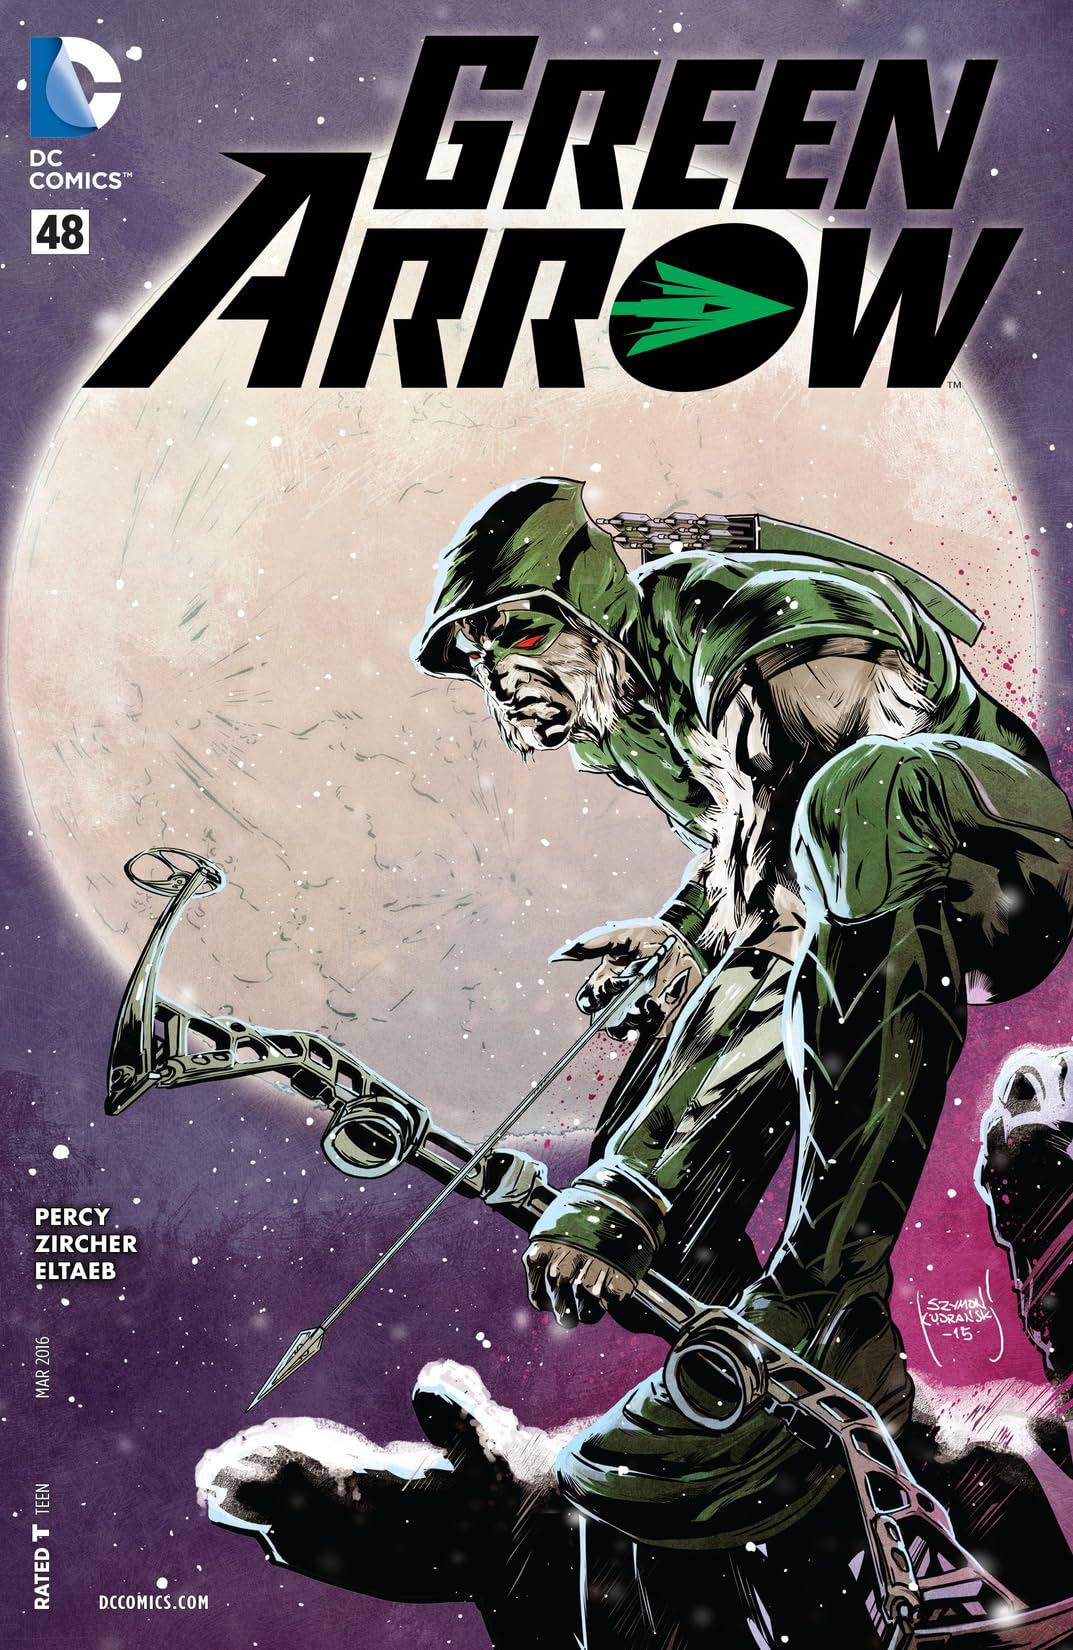 Green Arrow (2011-2016) #48